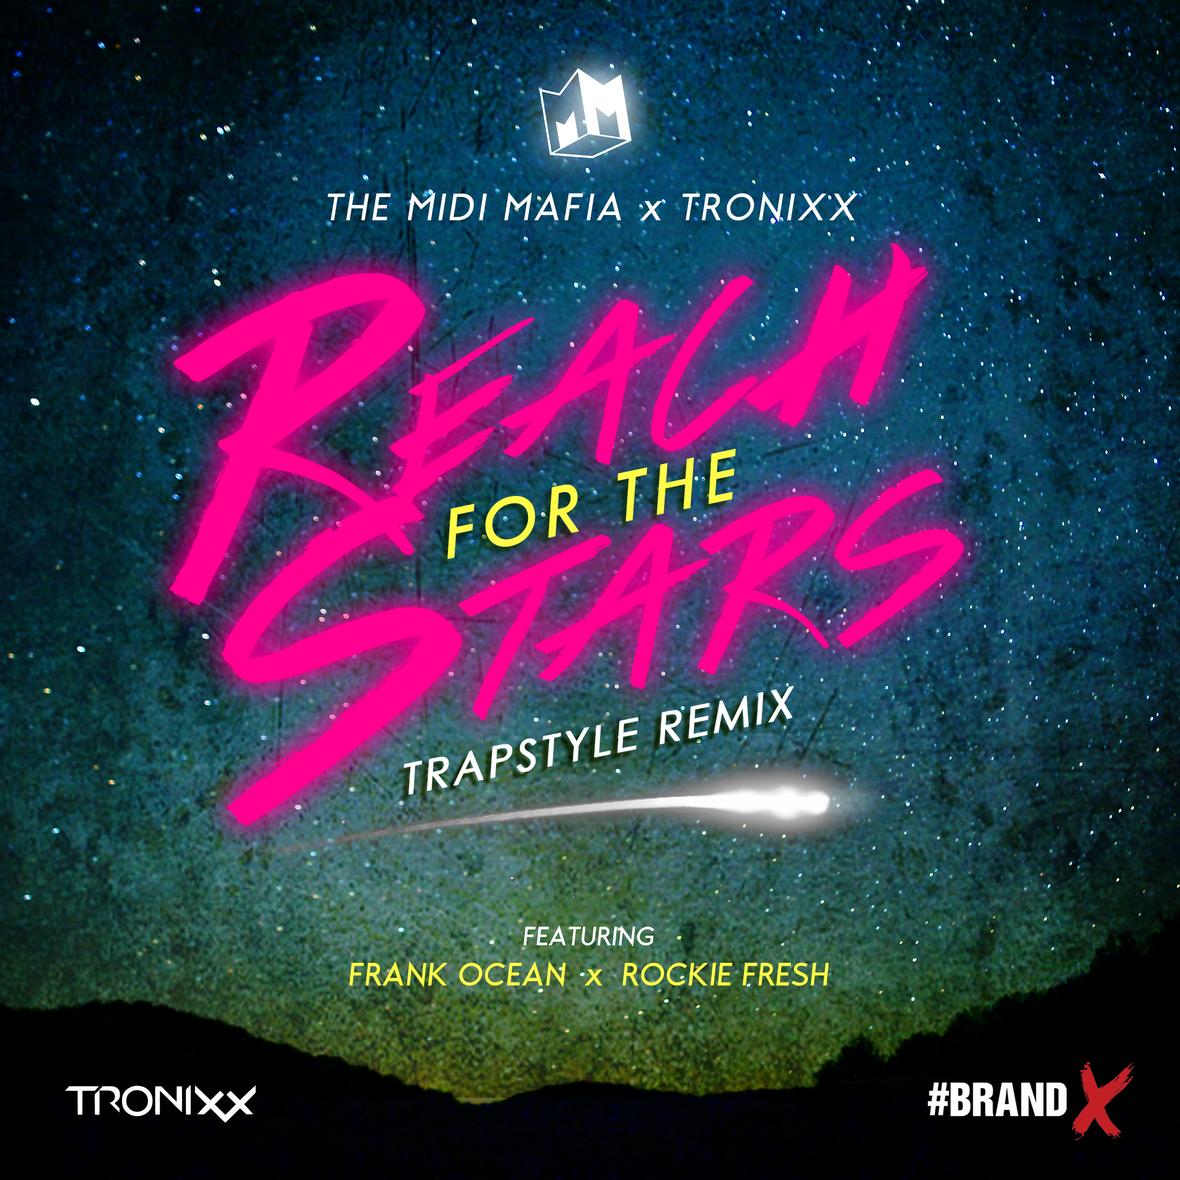 Midi Mafia x Tronixx - Reach For The Stars (Feat. Frank Ocean & Rockie Fresh)